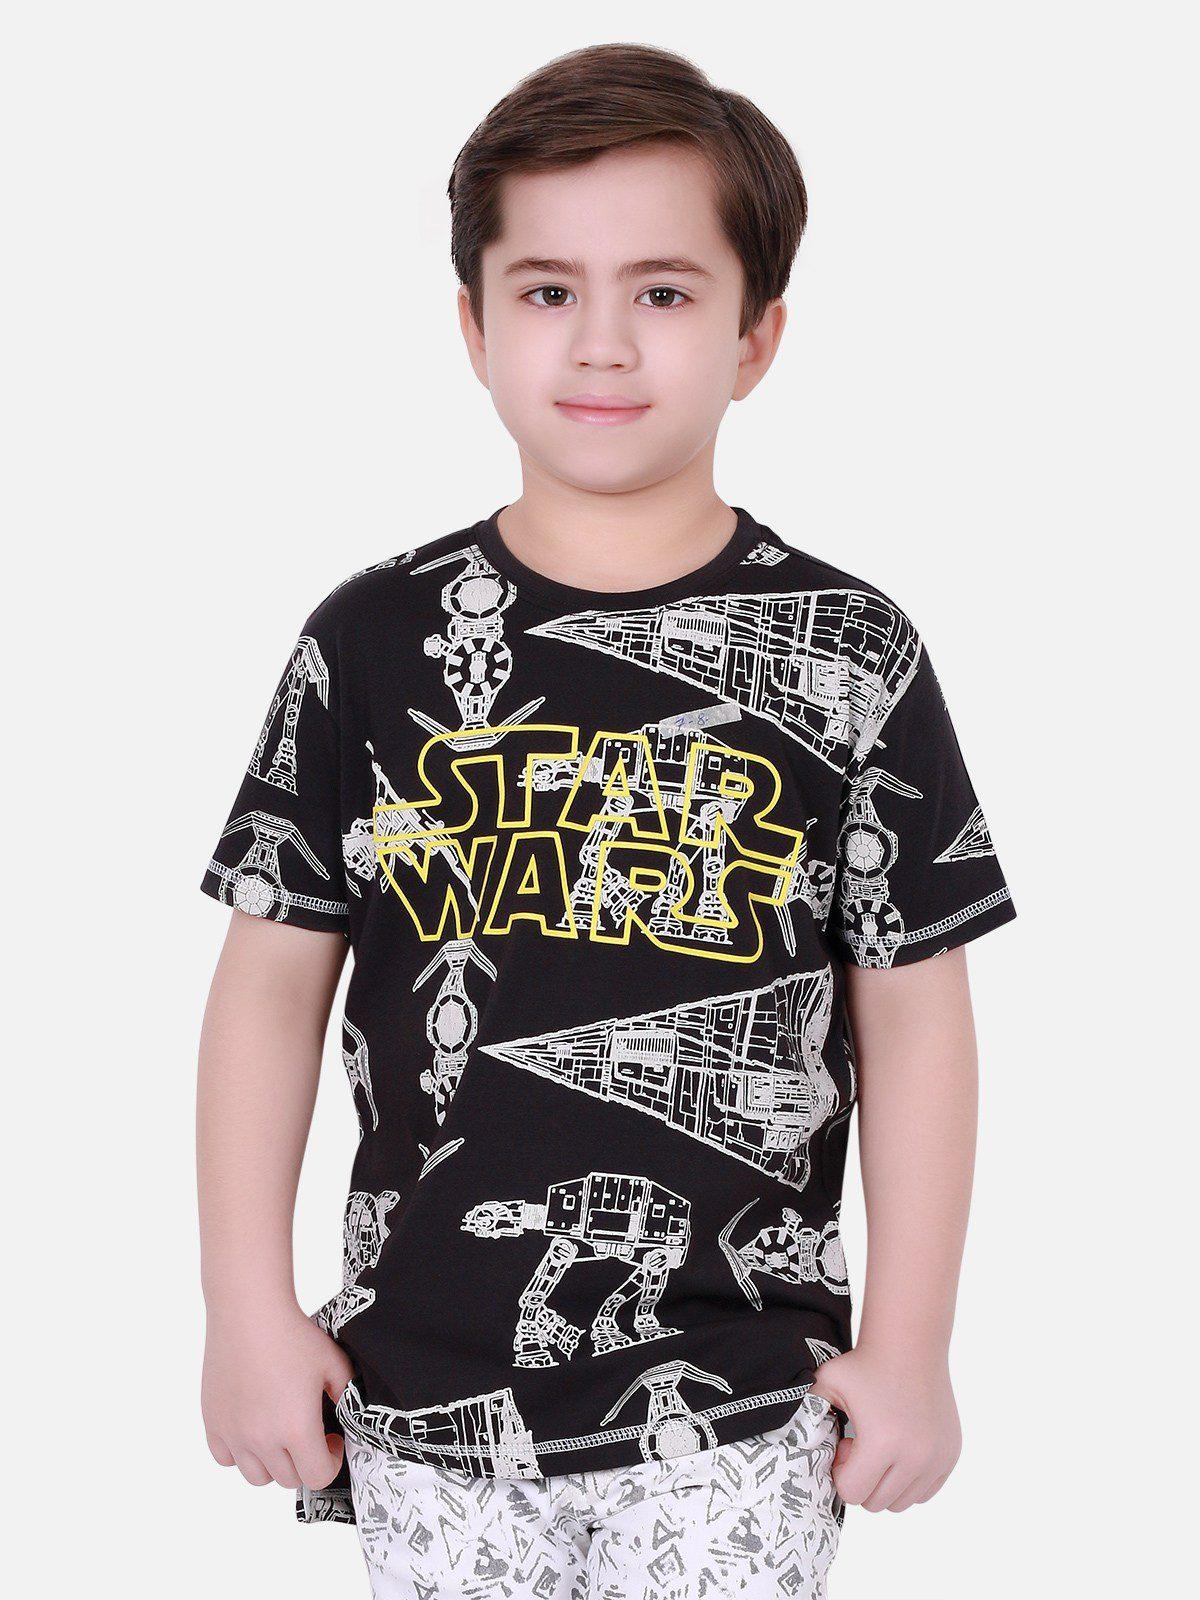 Amazing Stunning Boys Shirts Looking Design 2020